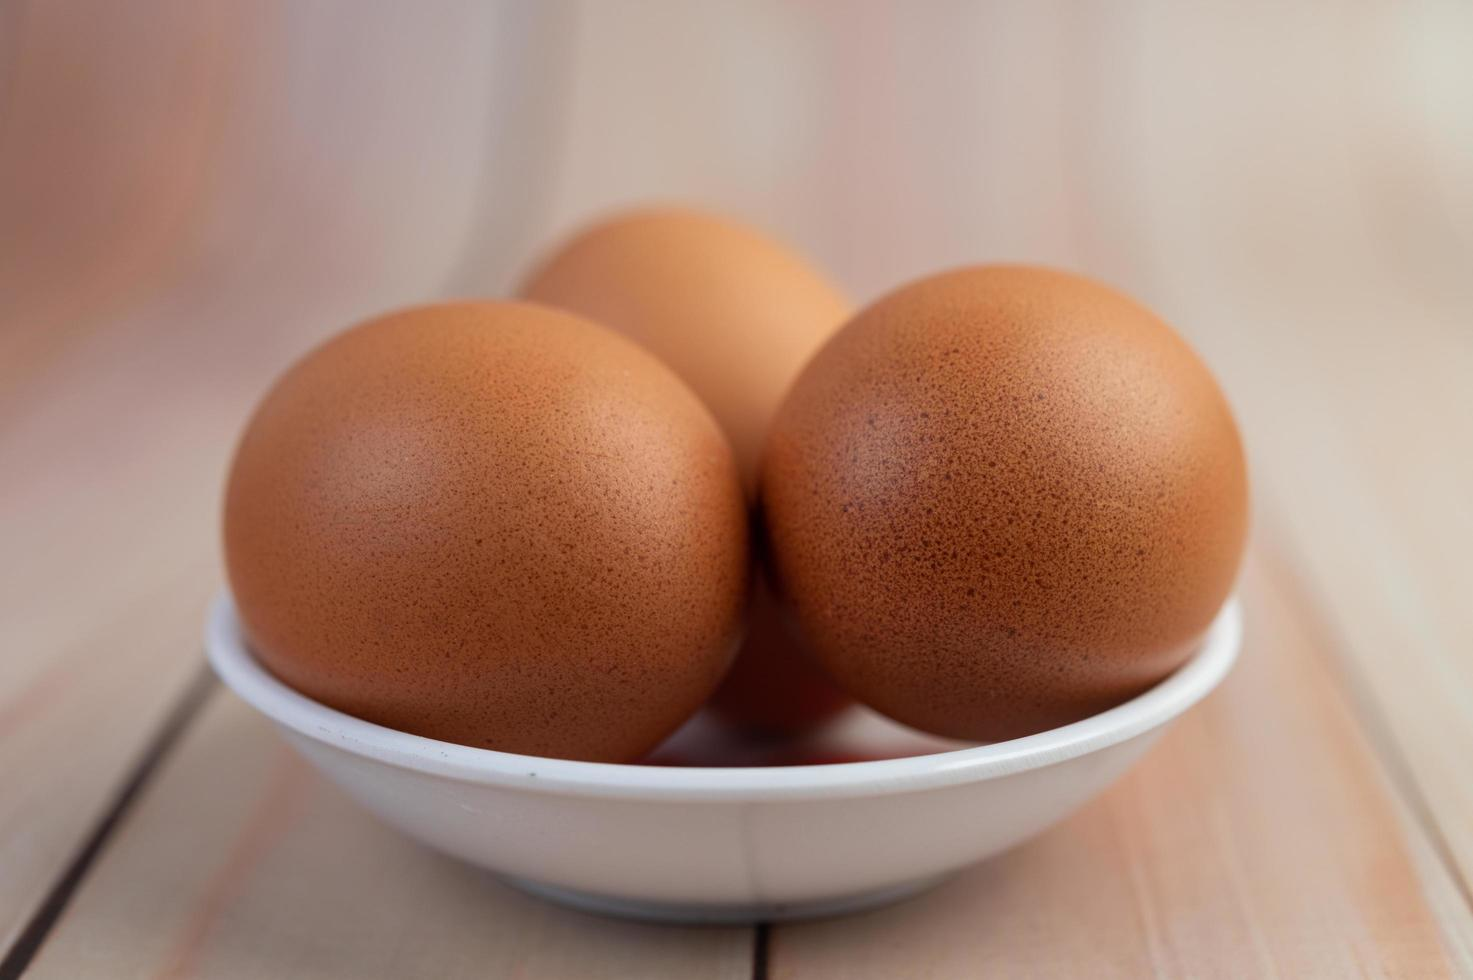 eieren in een klein kopje foto